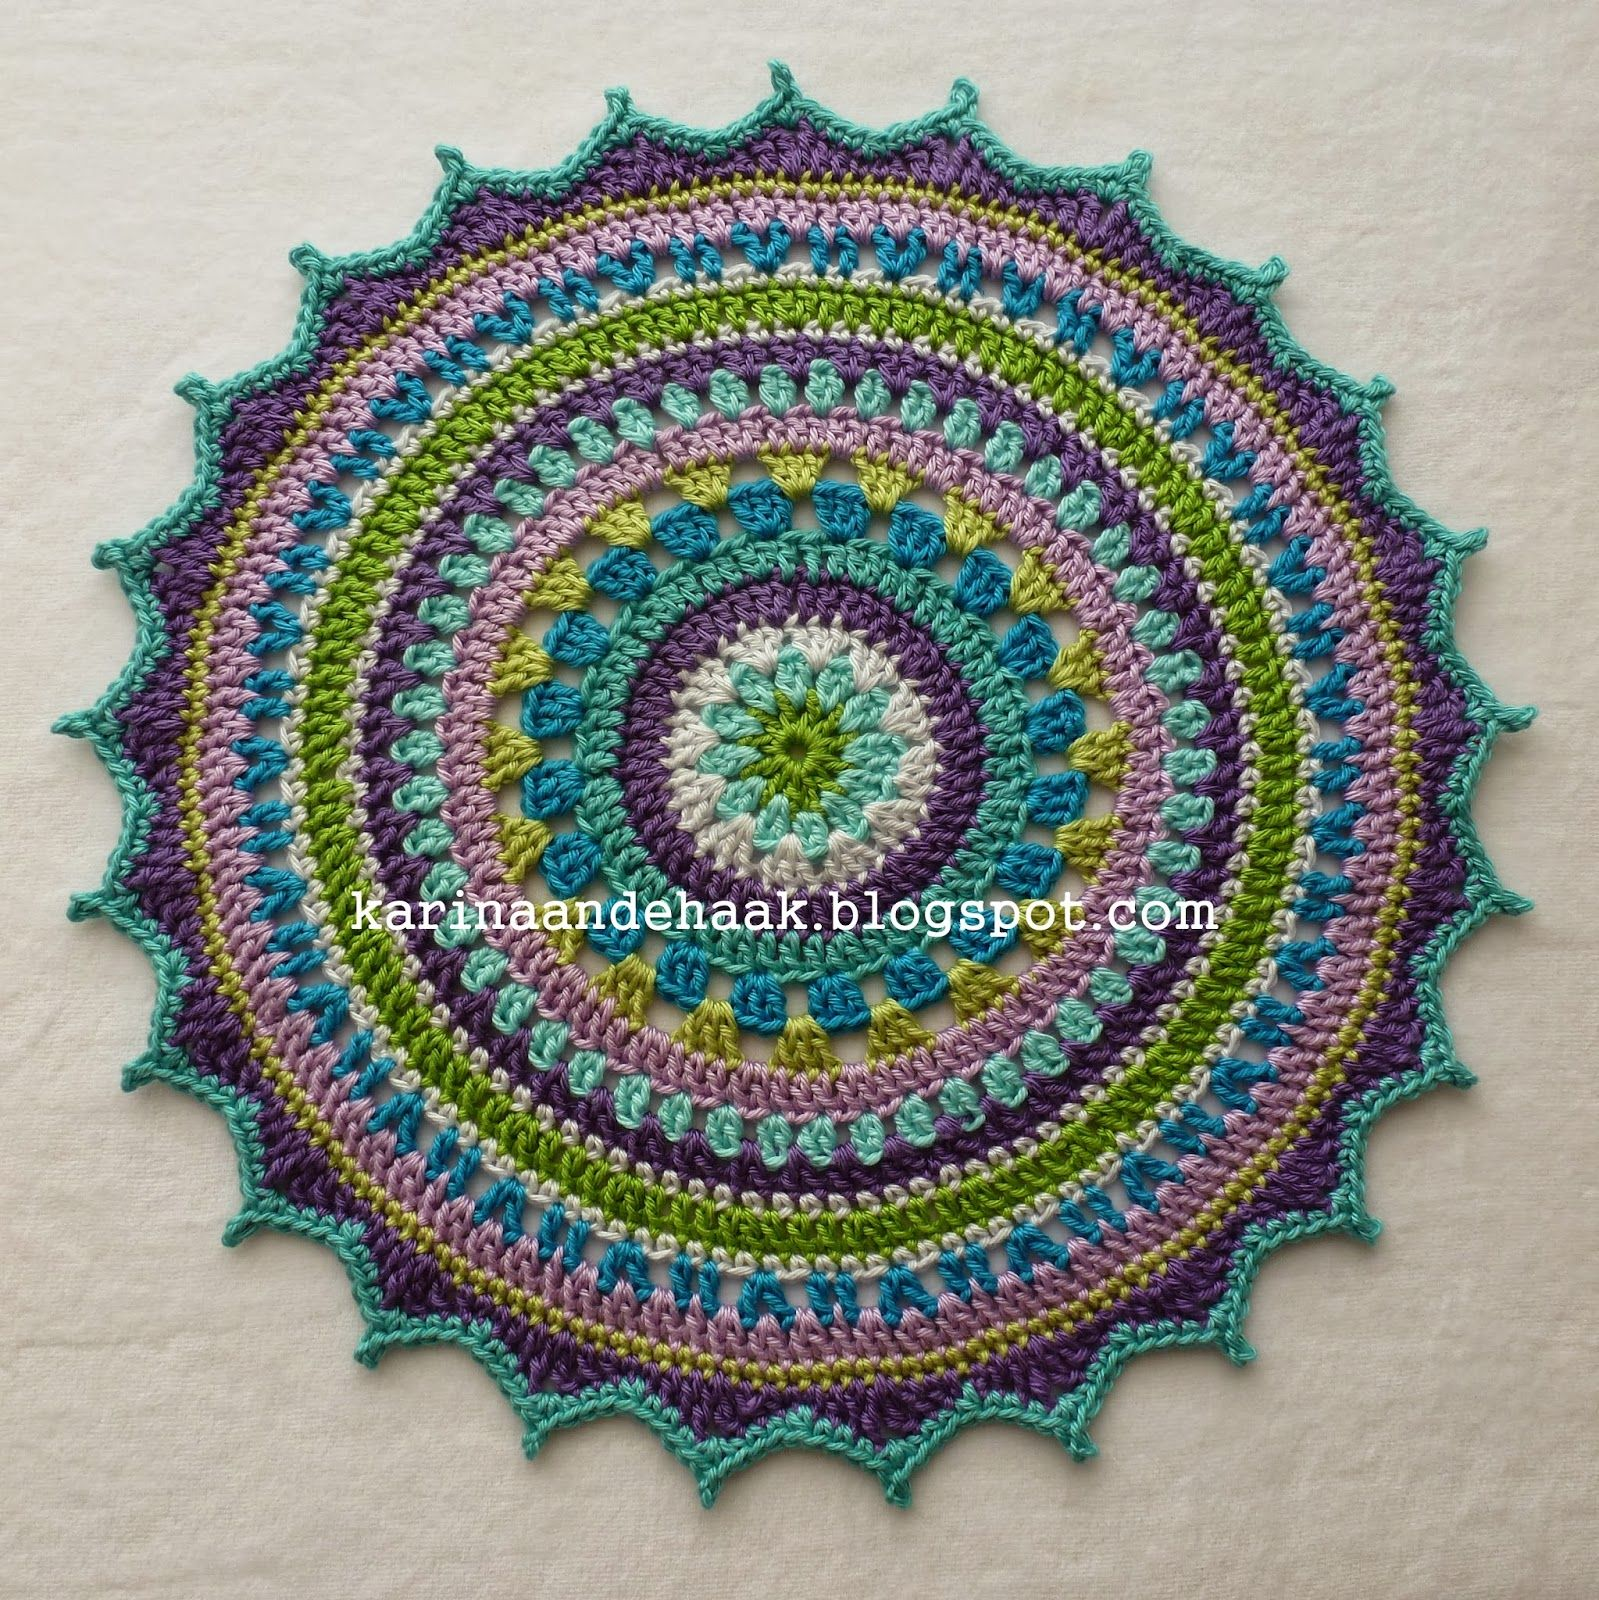 Karin aan de haak! Kleedje voor Boeddha - Patroonhttp://made-in-k-town.blogspot.de/2012/05/little-spring-mandala.html?m=1